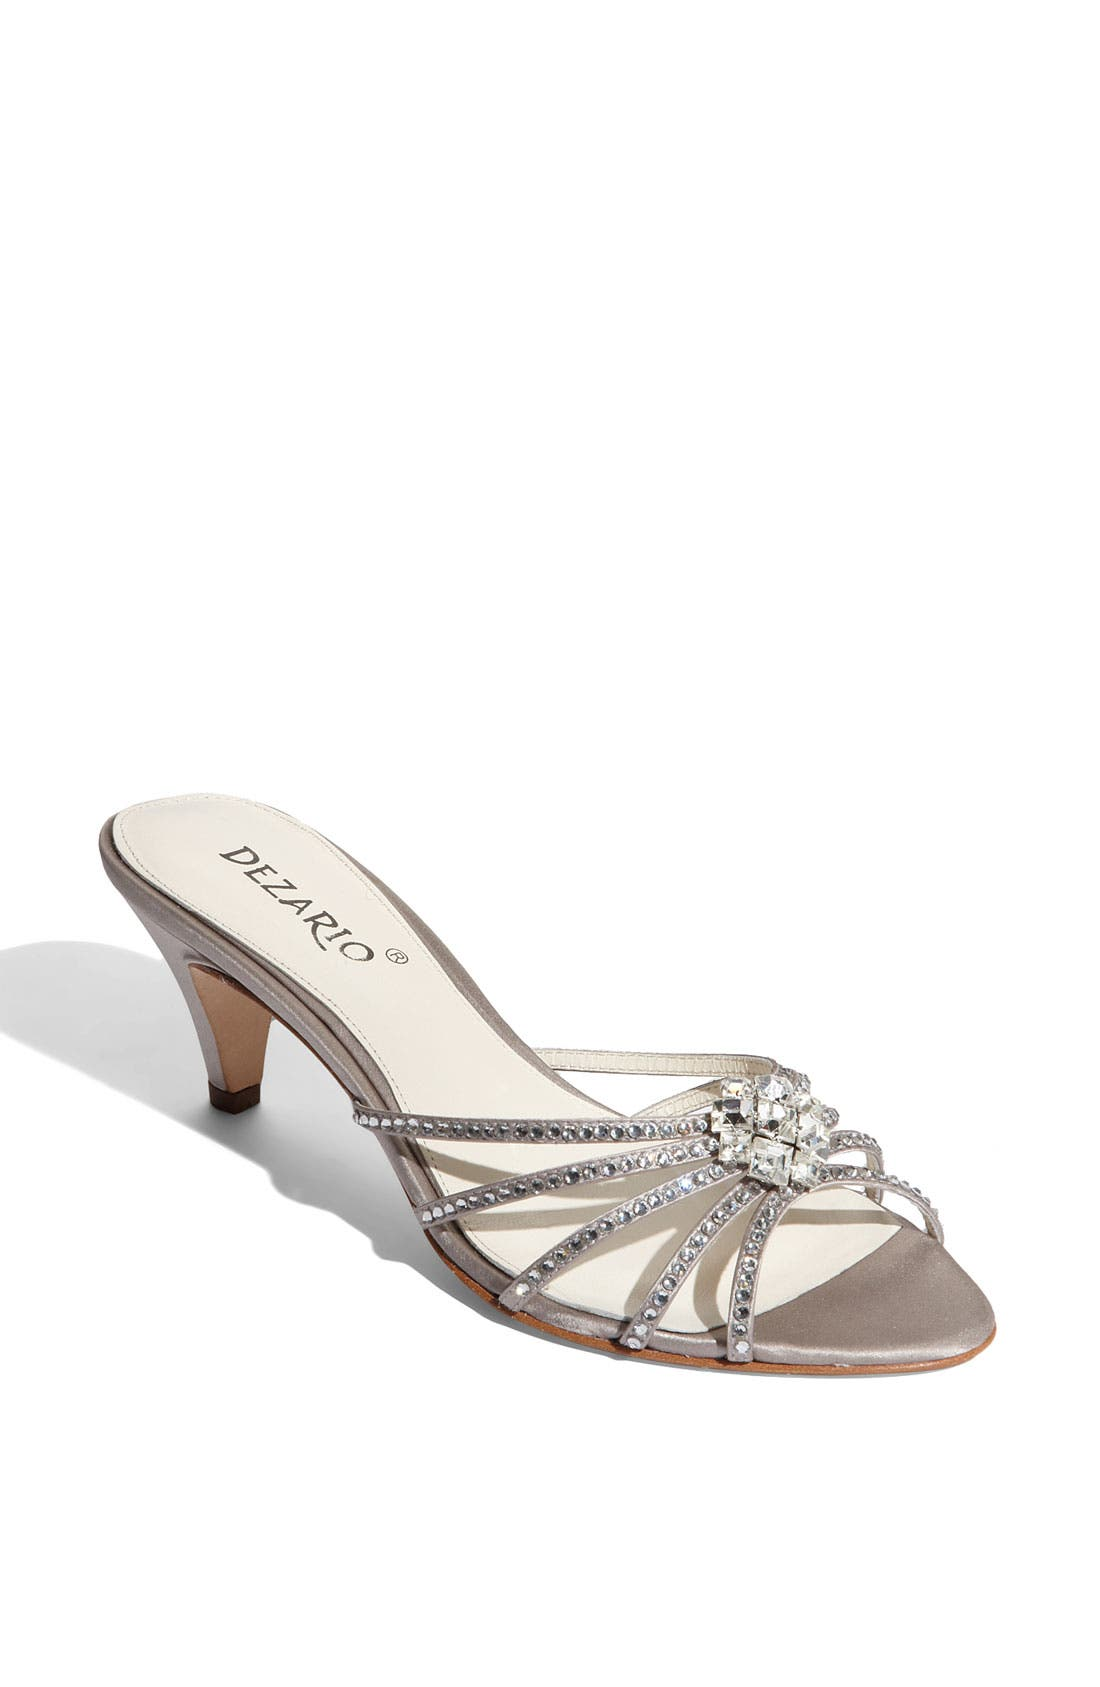 Alternate Image 1 Selected - Dezario 'Lady' Slide Sandal